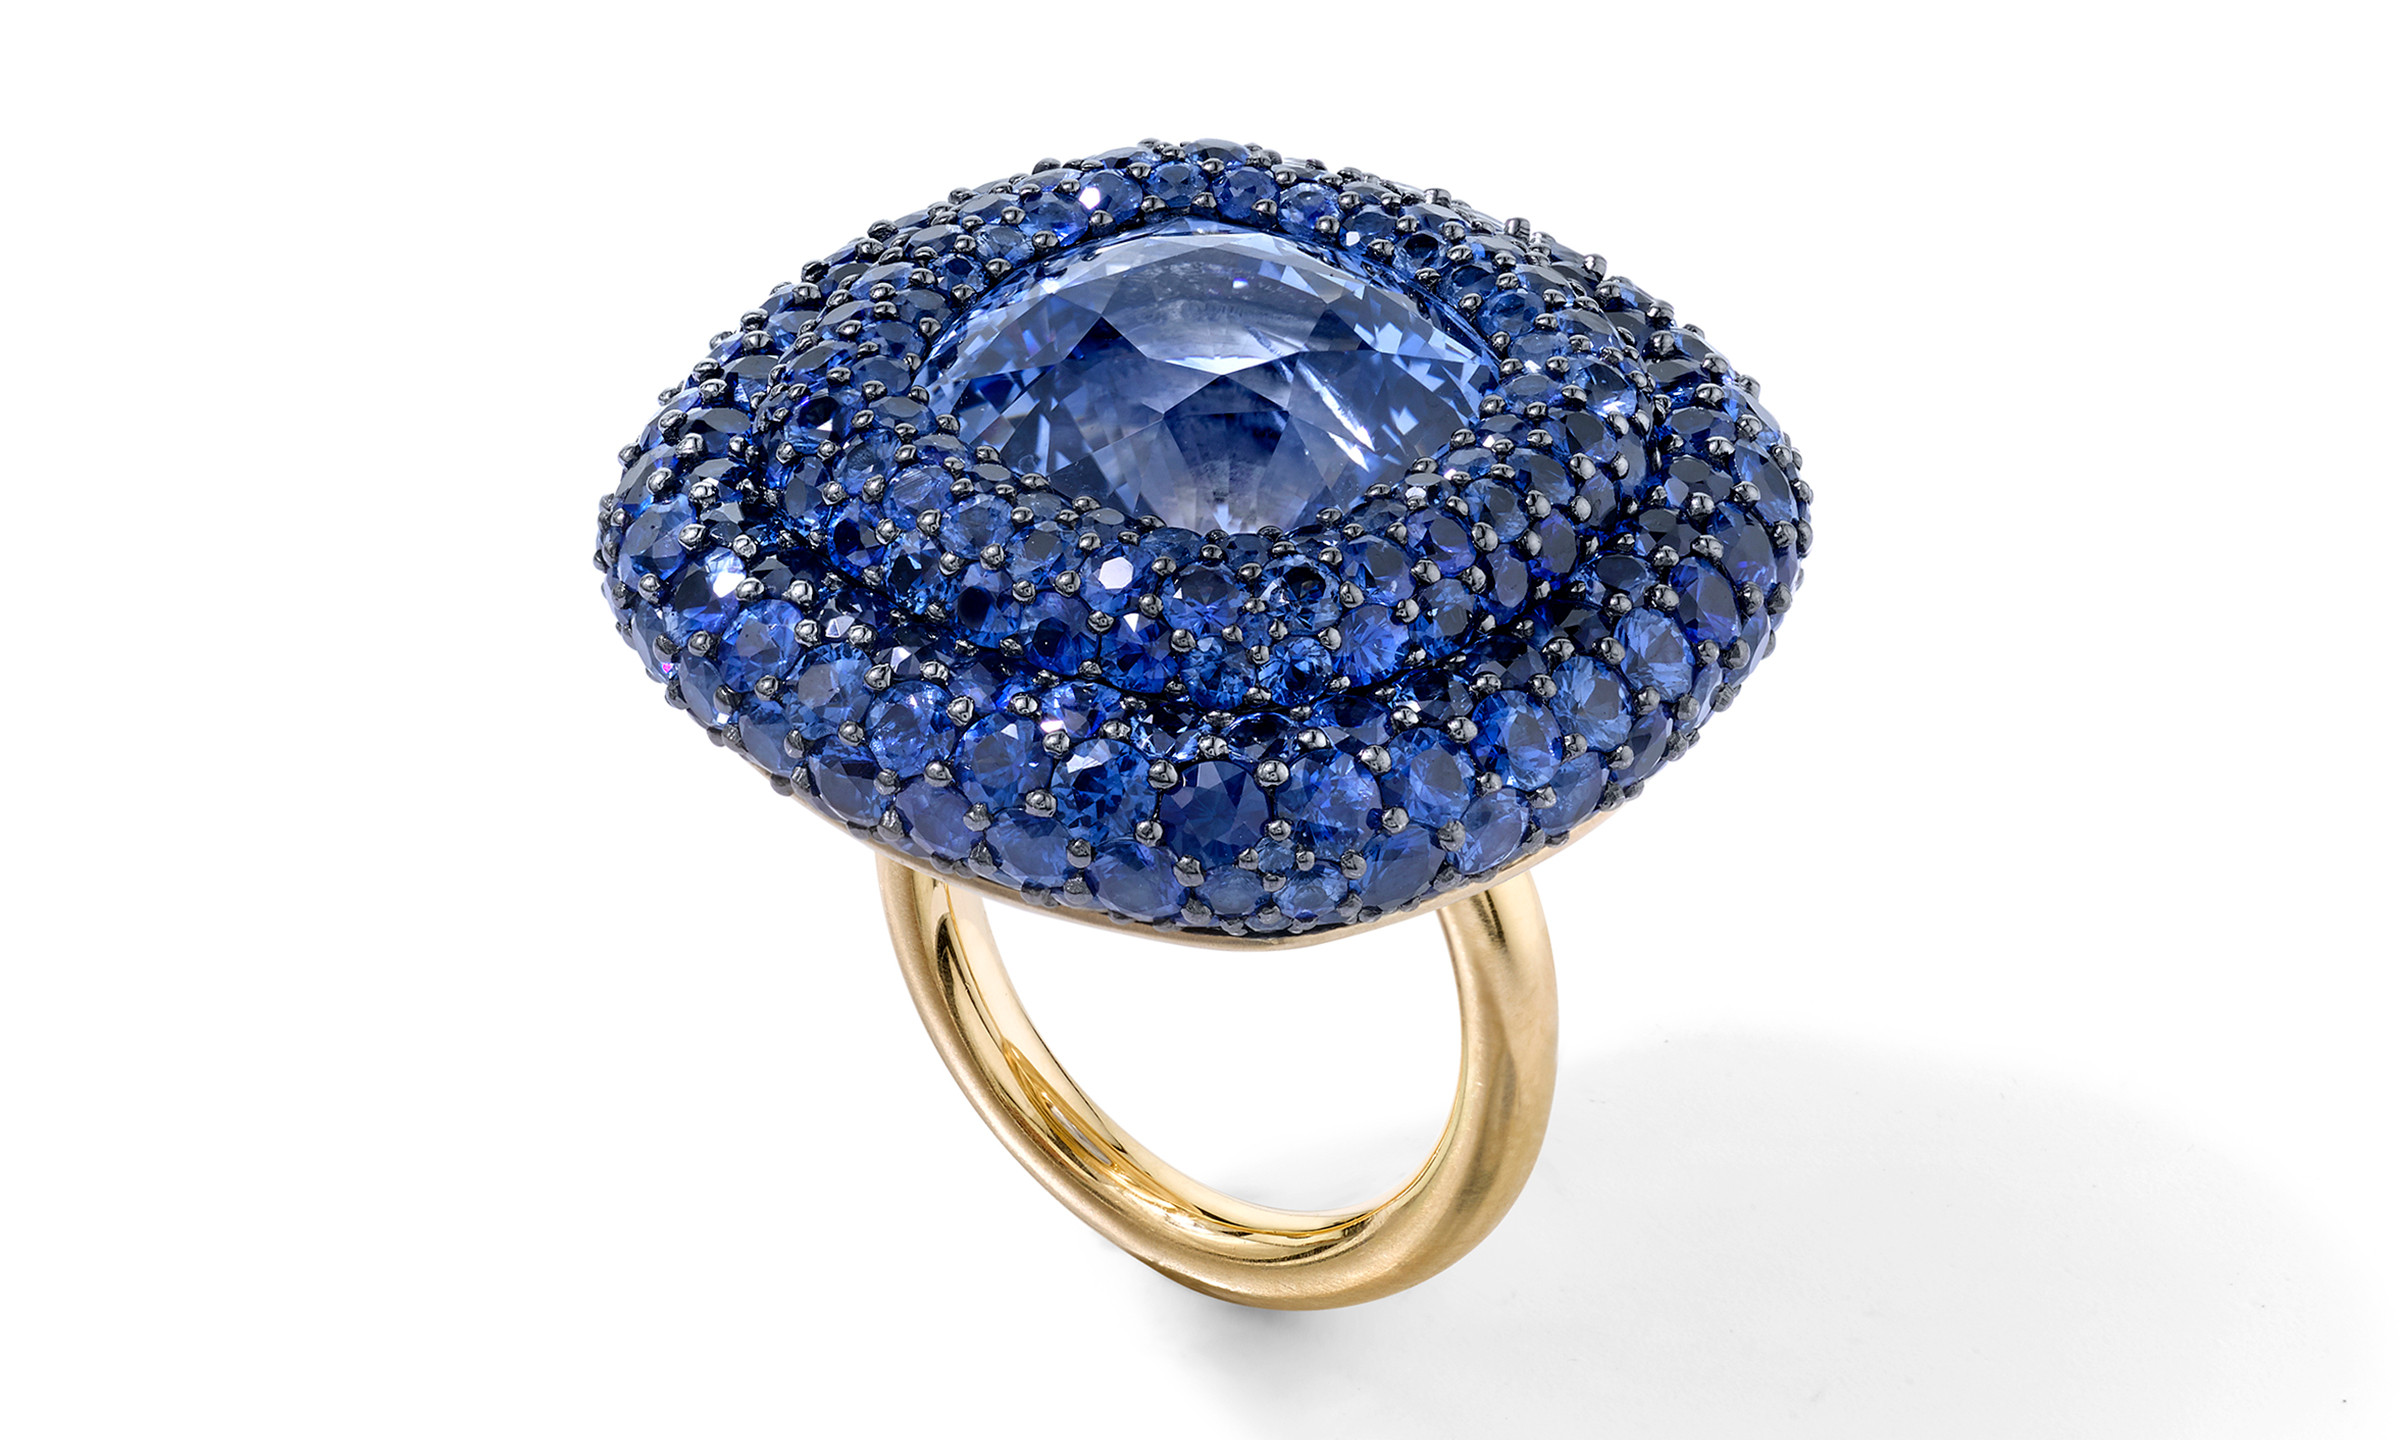 VRAM OAK BLUE SAPPHIRE RING (2)